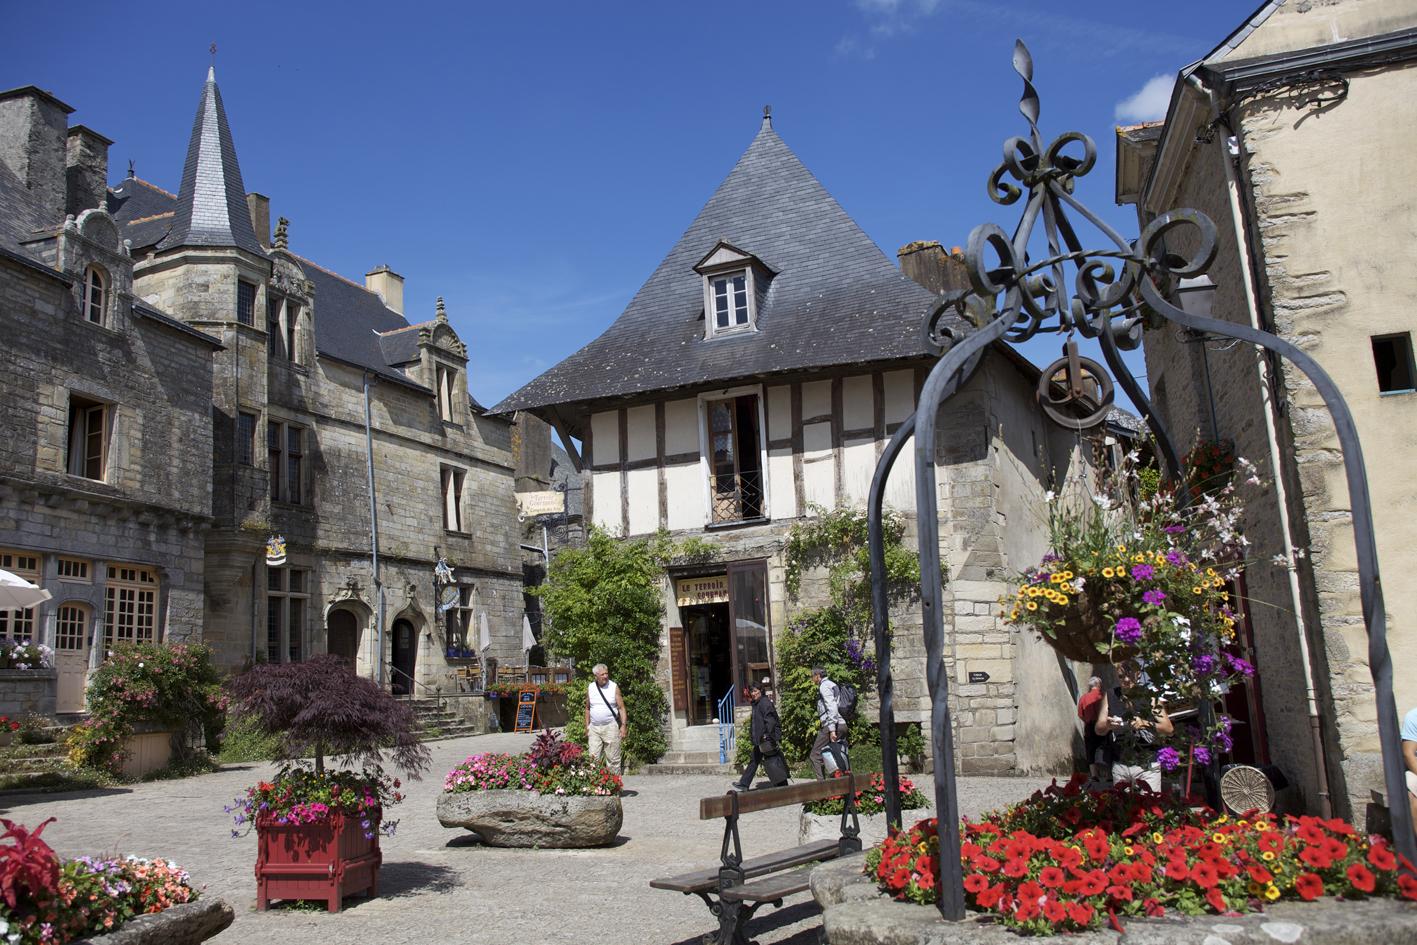 rochefort-en-terre_4540287896_o